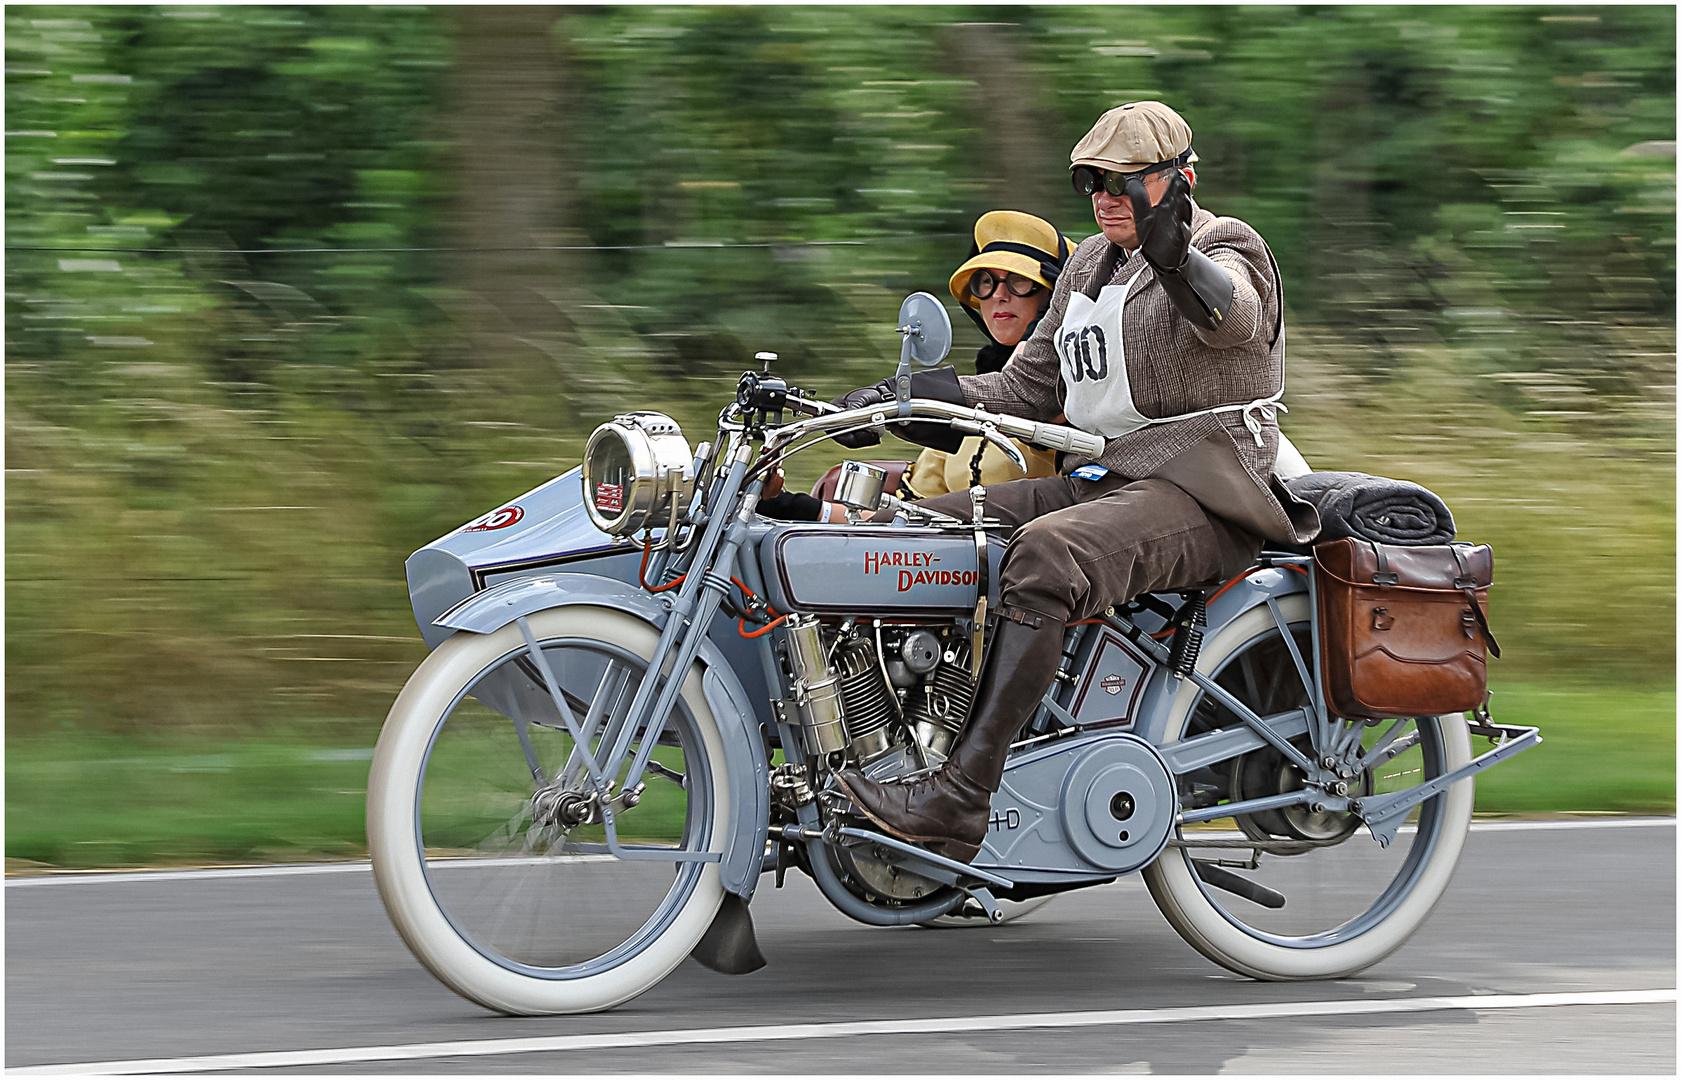 Harley - Driver